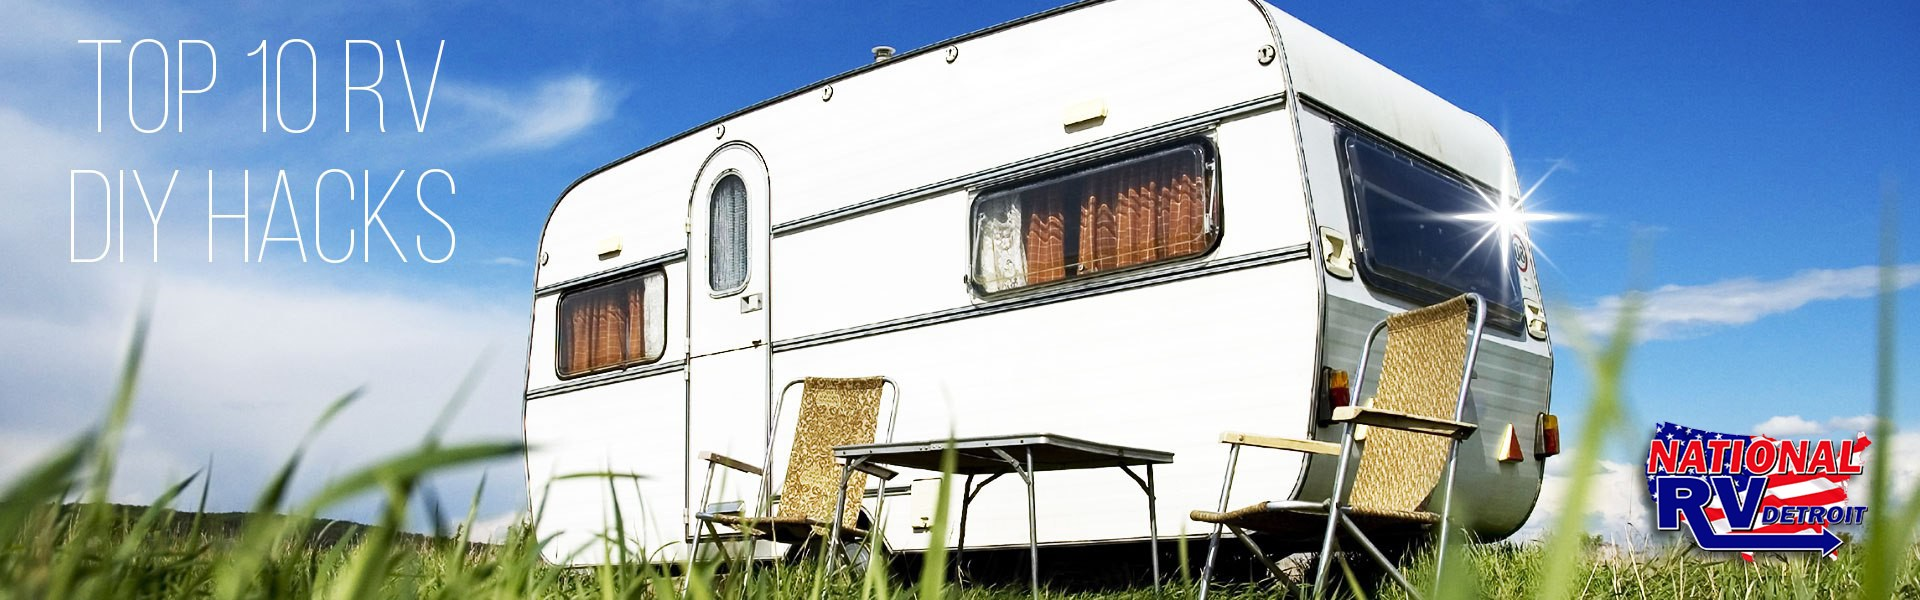 Top 10 RV DIY Hacks - Travel Trailer in a field of grass